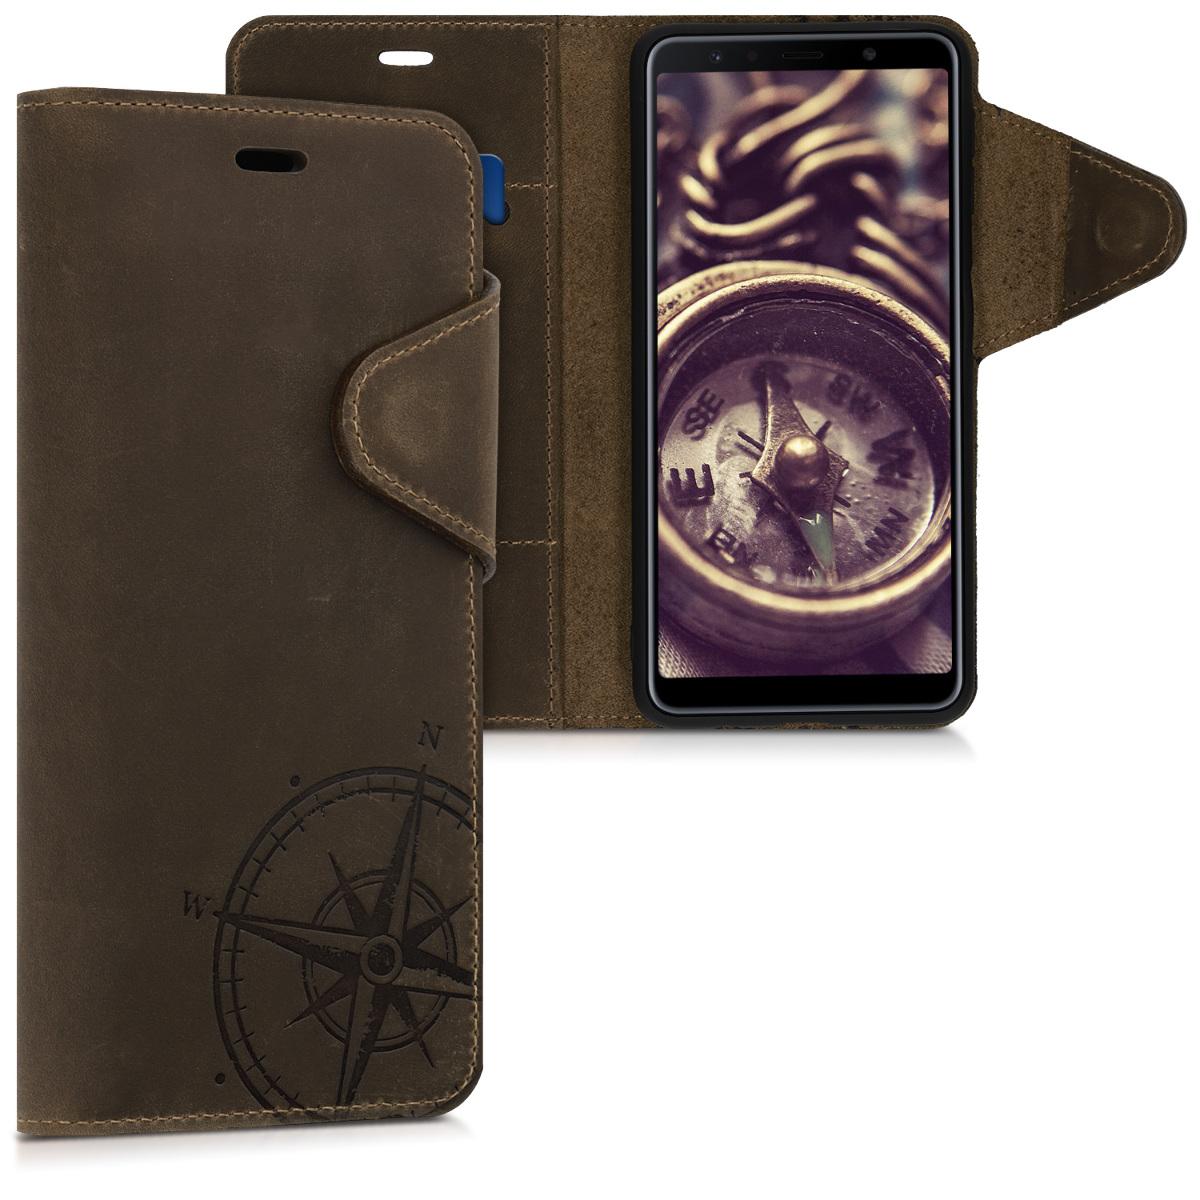 Kalibri Δερμάτινη Suede Θήκη - Πορτοφόλι Samsung Galaxy A7 (2018) - Brown Compass